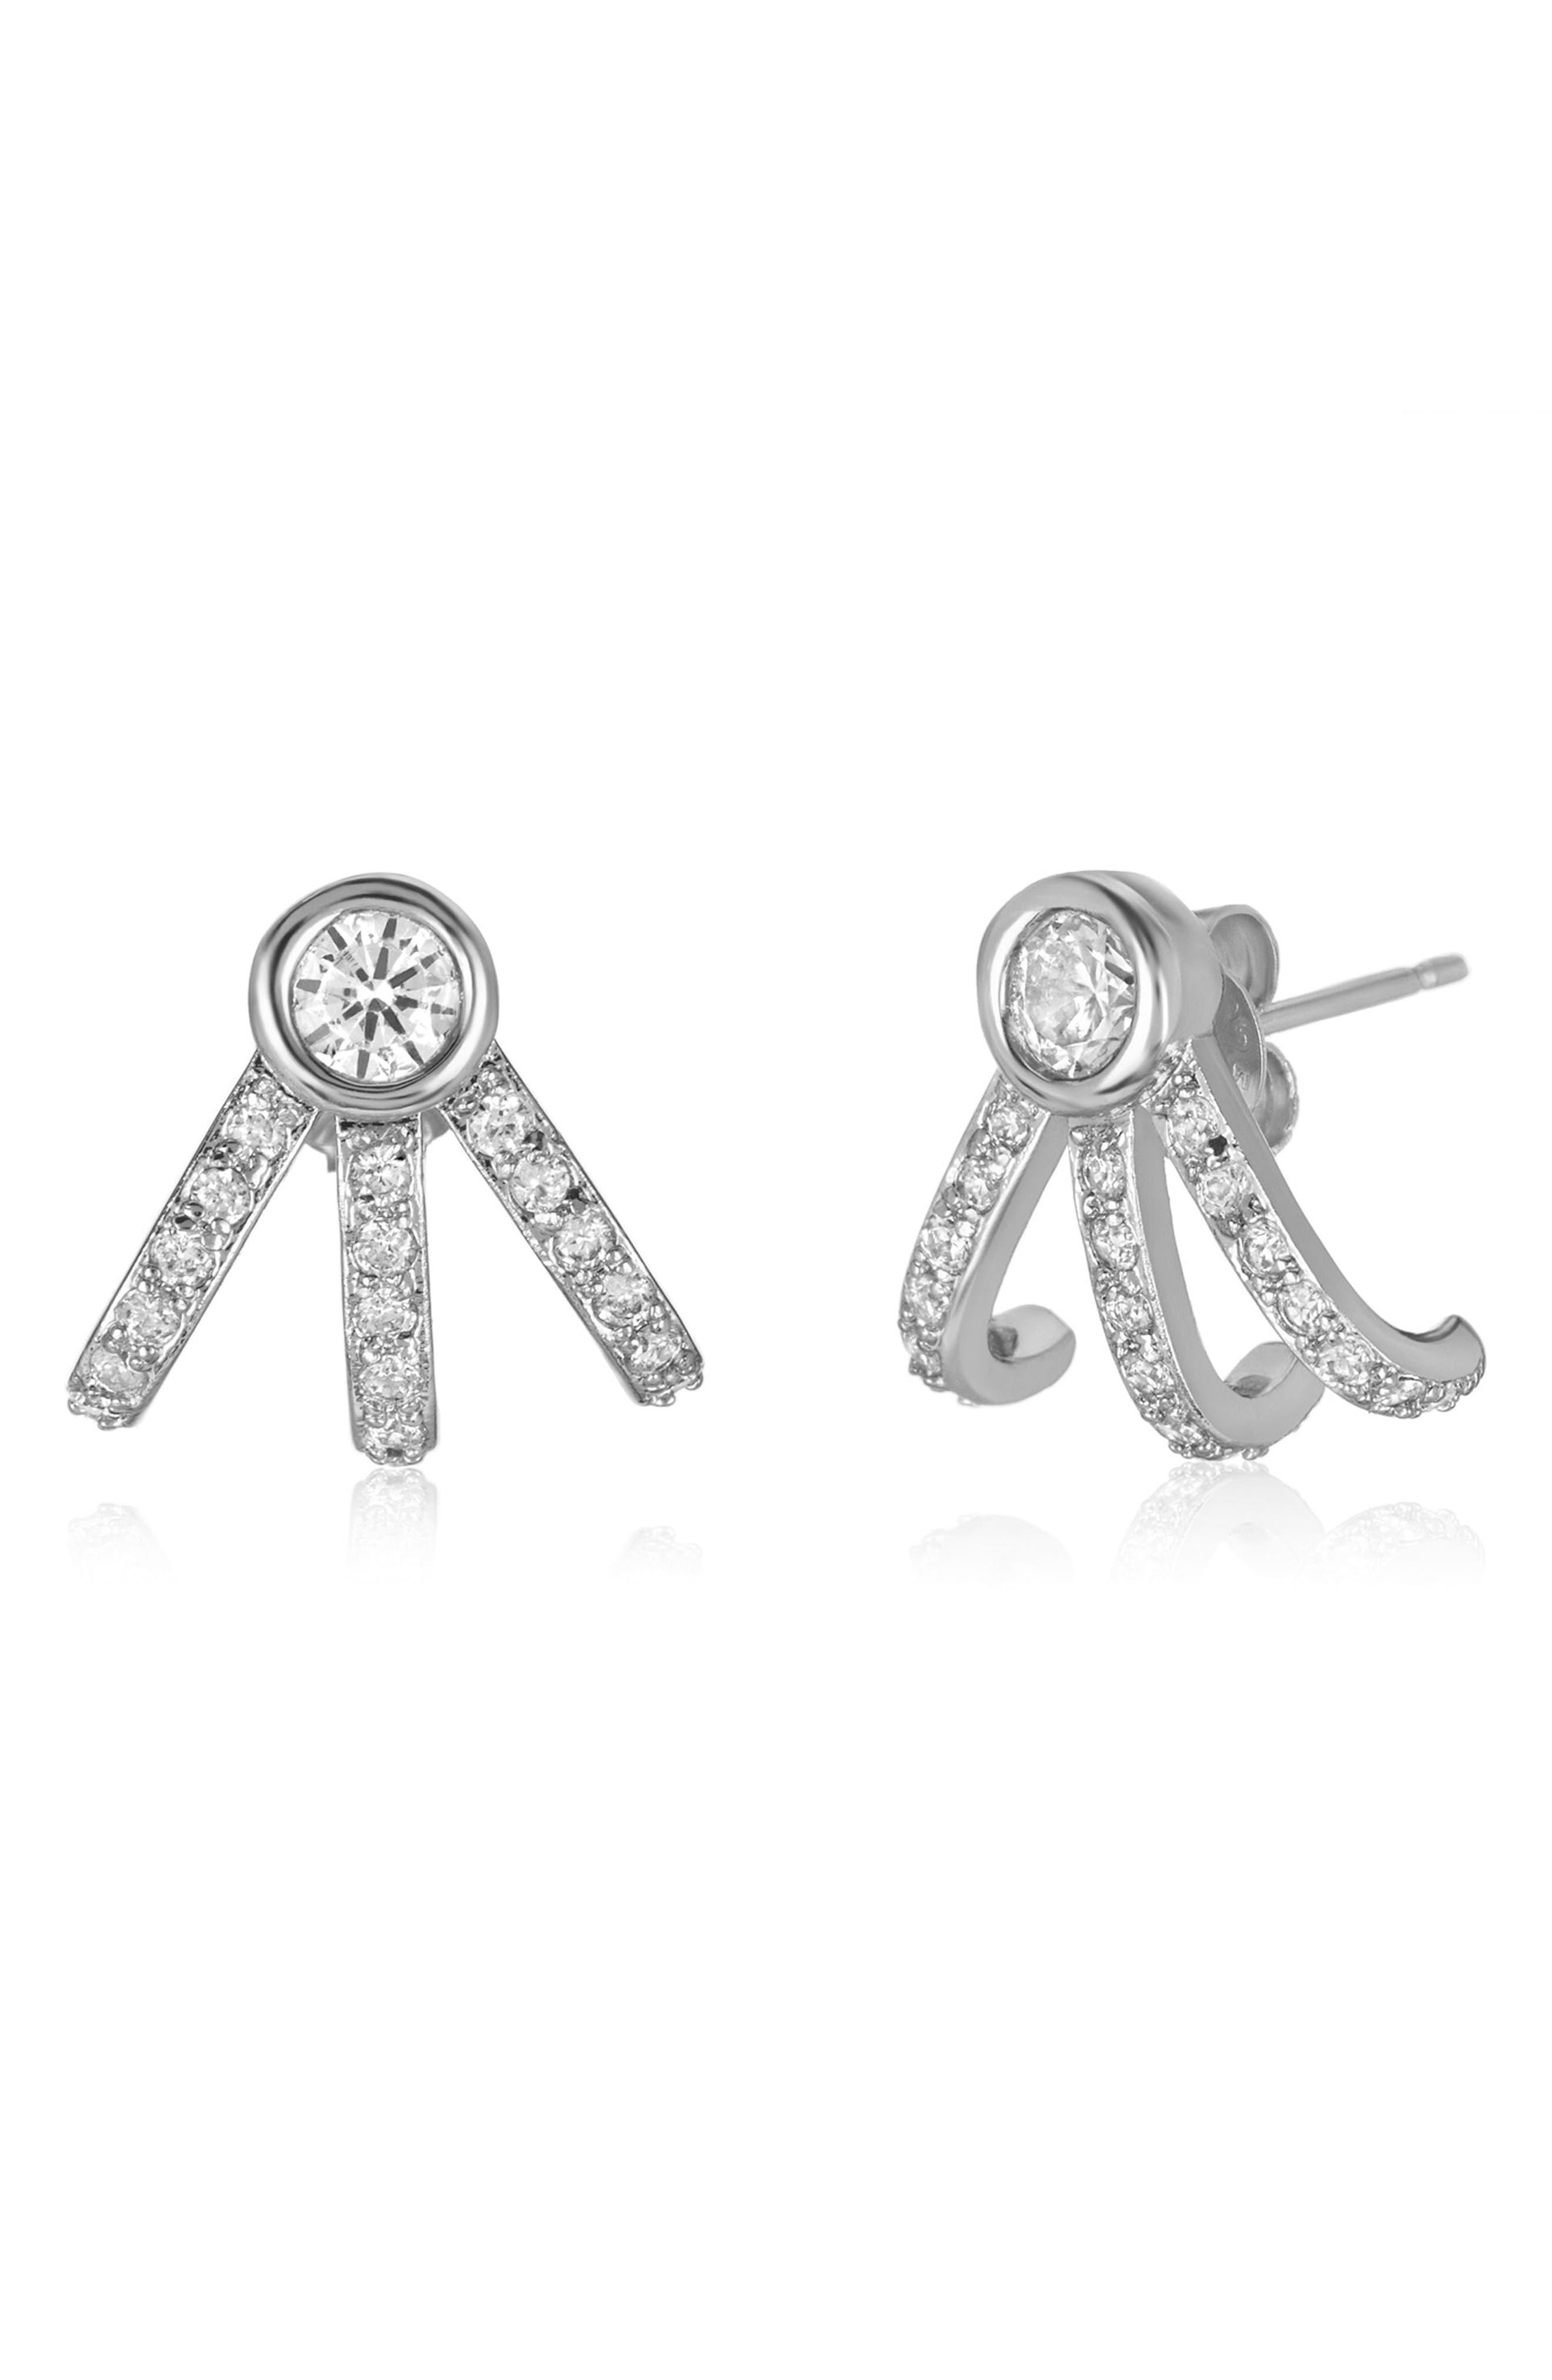 Main Image - Melinda Maria Mini Huggie Earrings